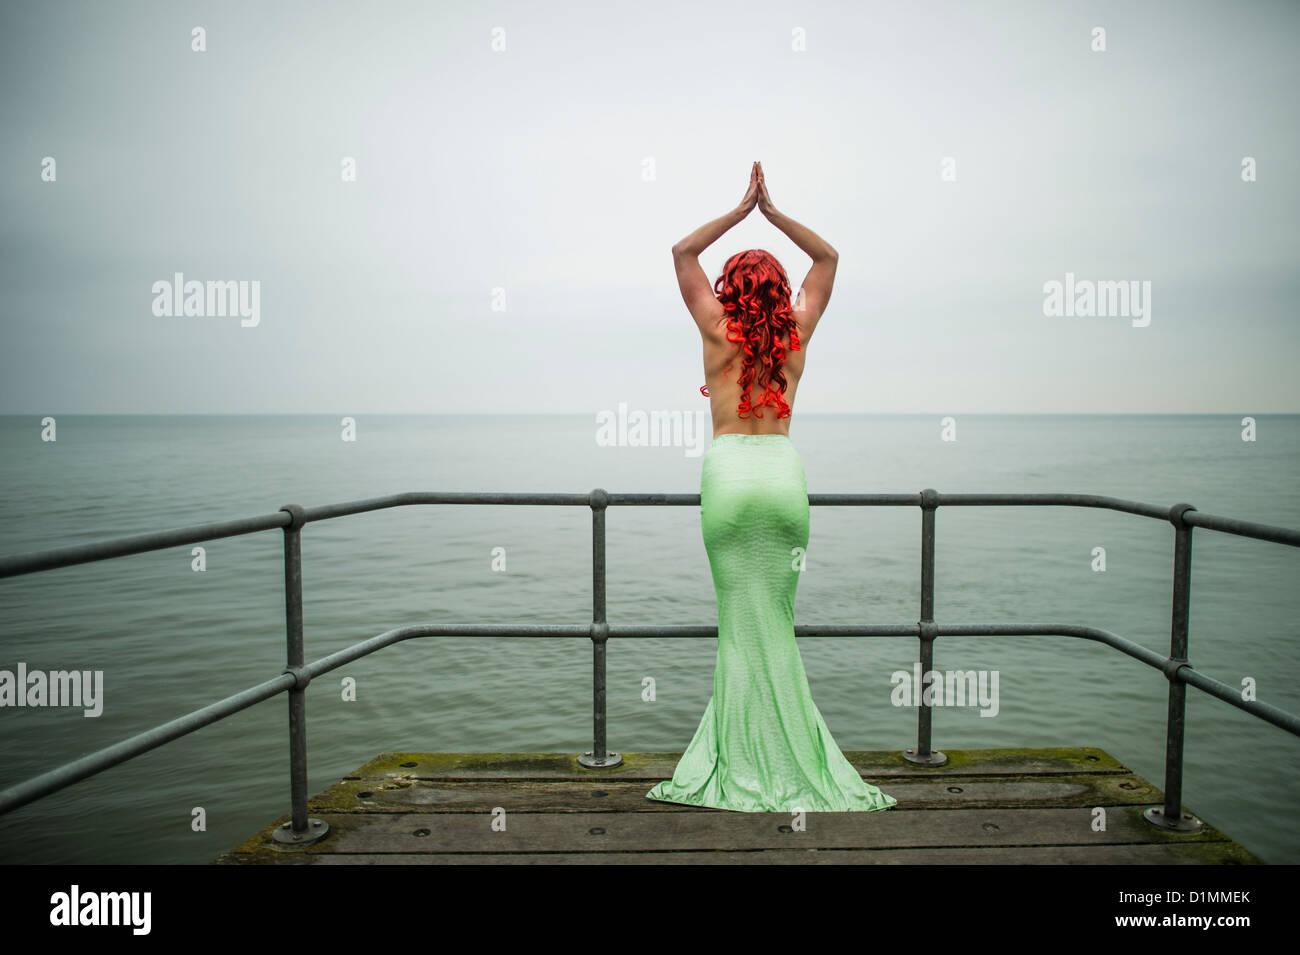 Meerjungfrau kleid tanzen